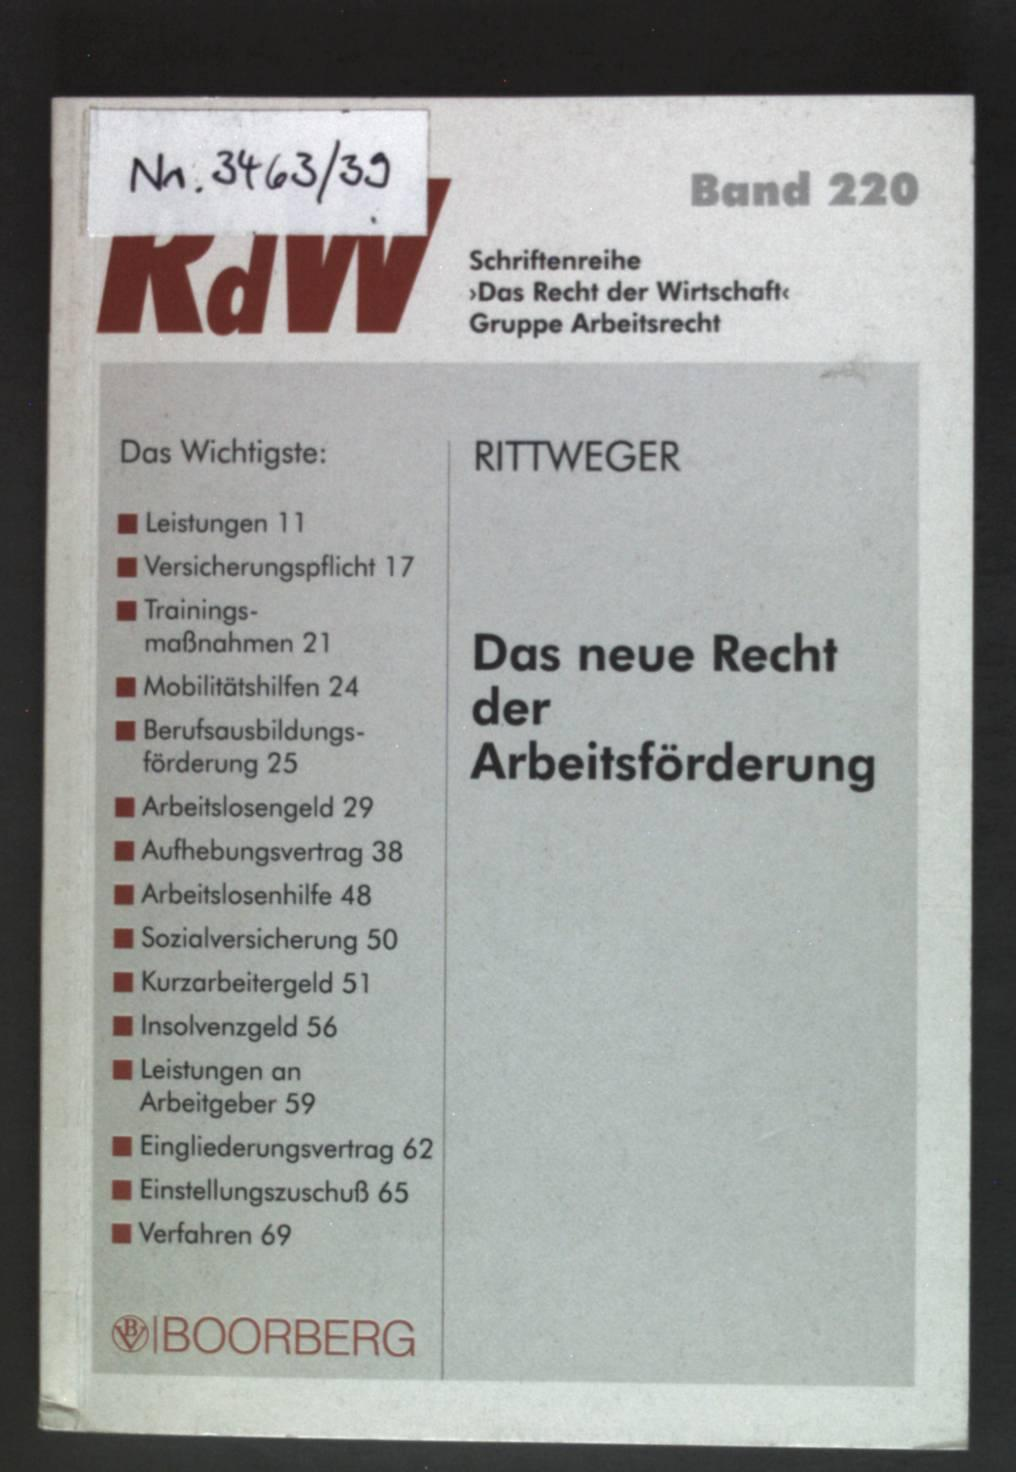 Das neue Recht der Arbeitsförderung. Schriftenreihe Das Recht der Wirtschaft ; Bd. 220 : Gruppe Arbeitsrecht - Rittweger, Stephan